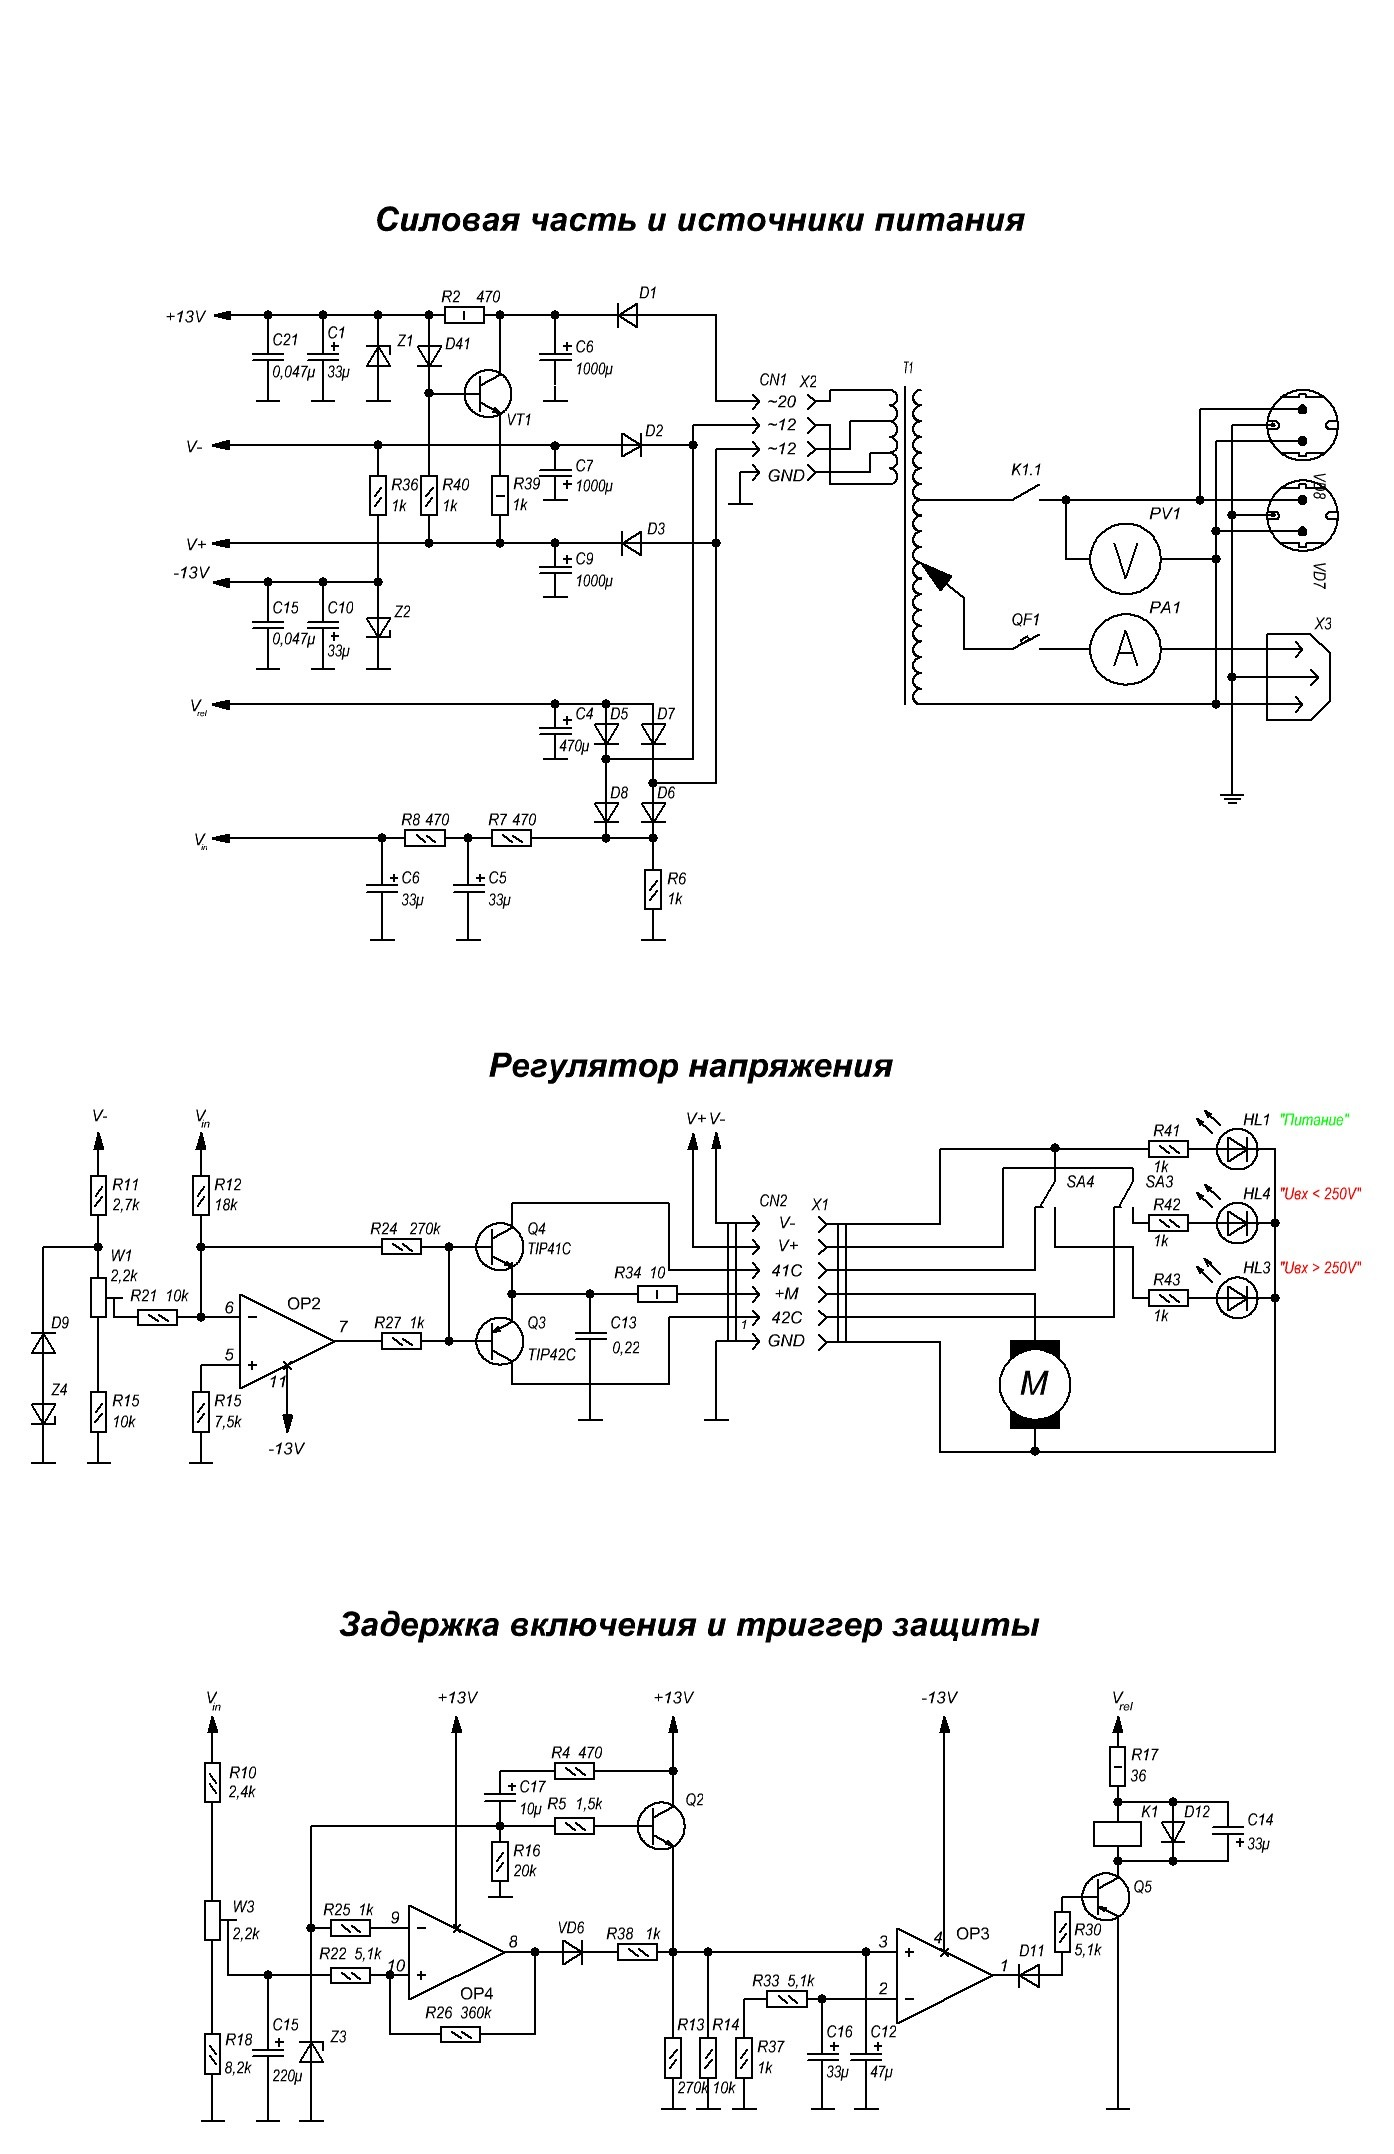 Схема стабилизатора ЭМКН-5000Ва